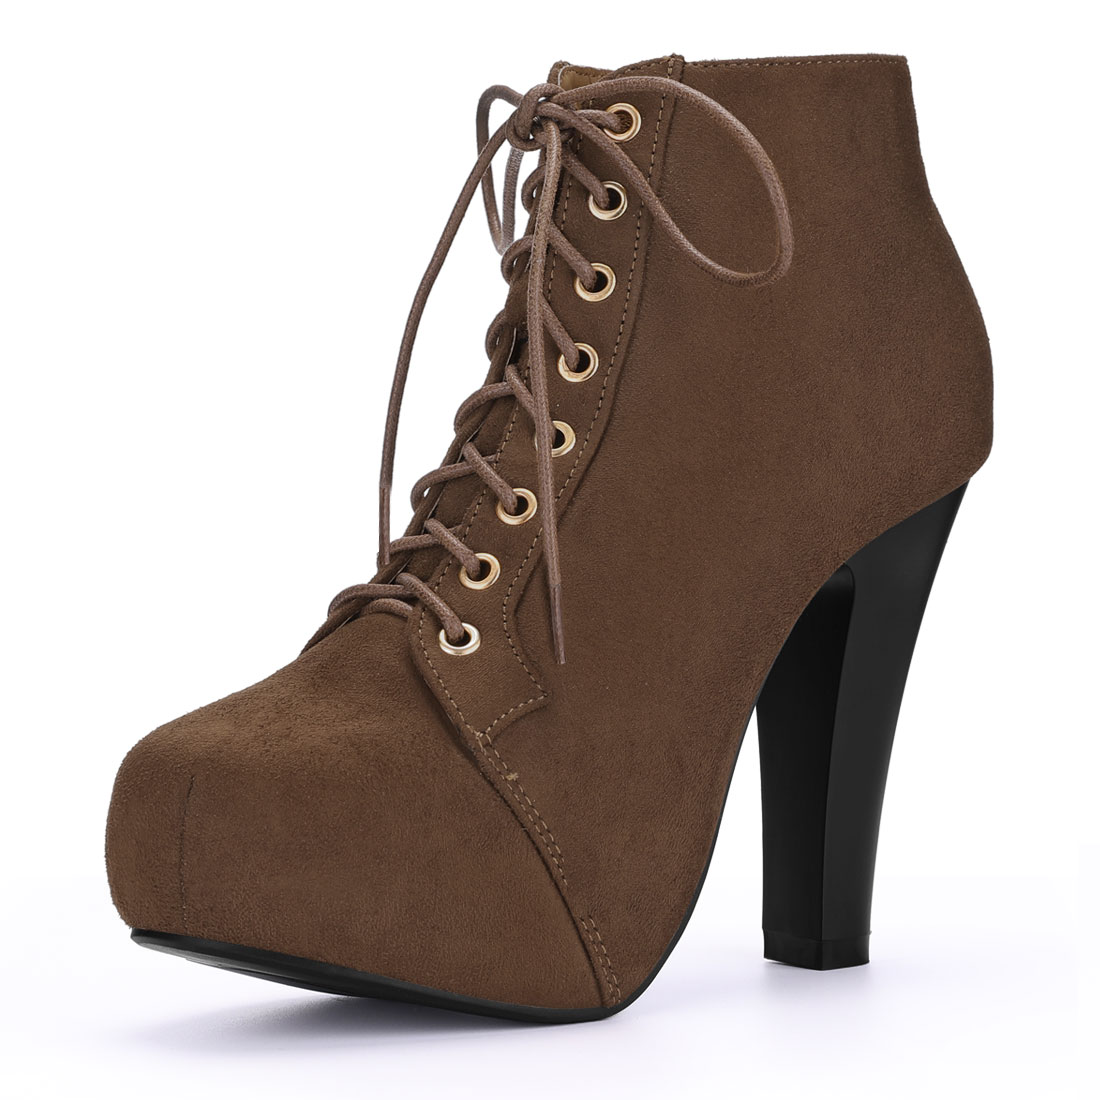 Women Round Toe High Heel Platform Lace Up Booties Coffee US 6